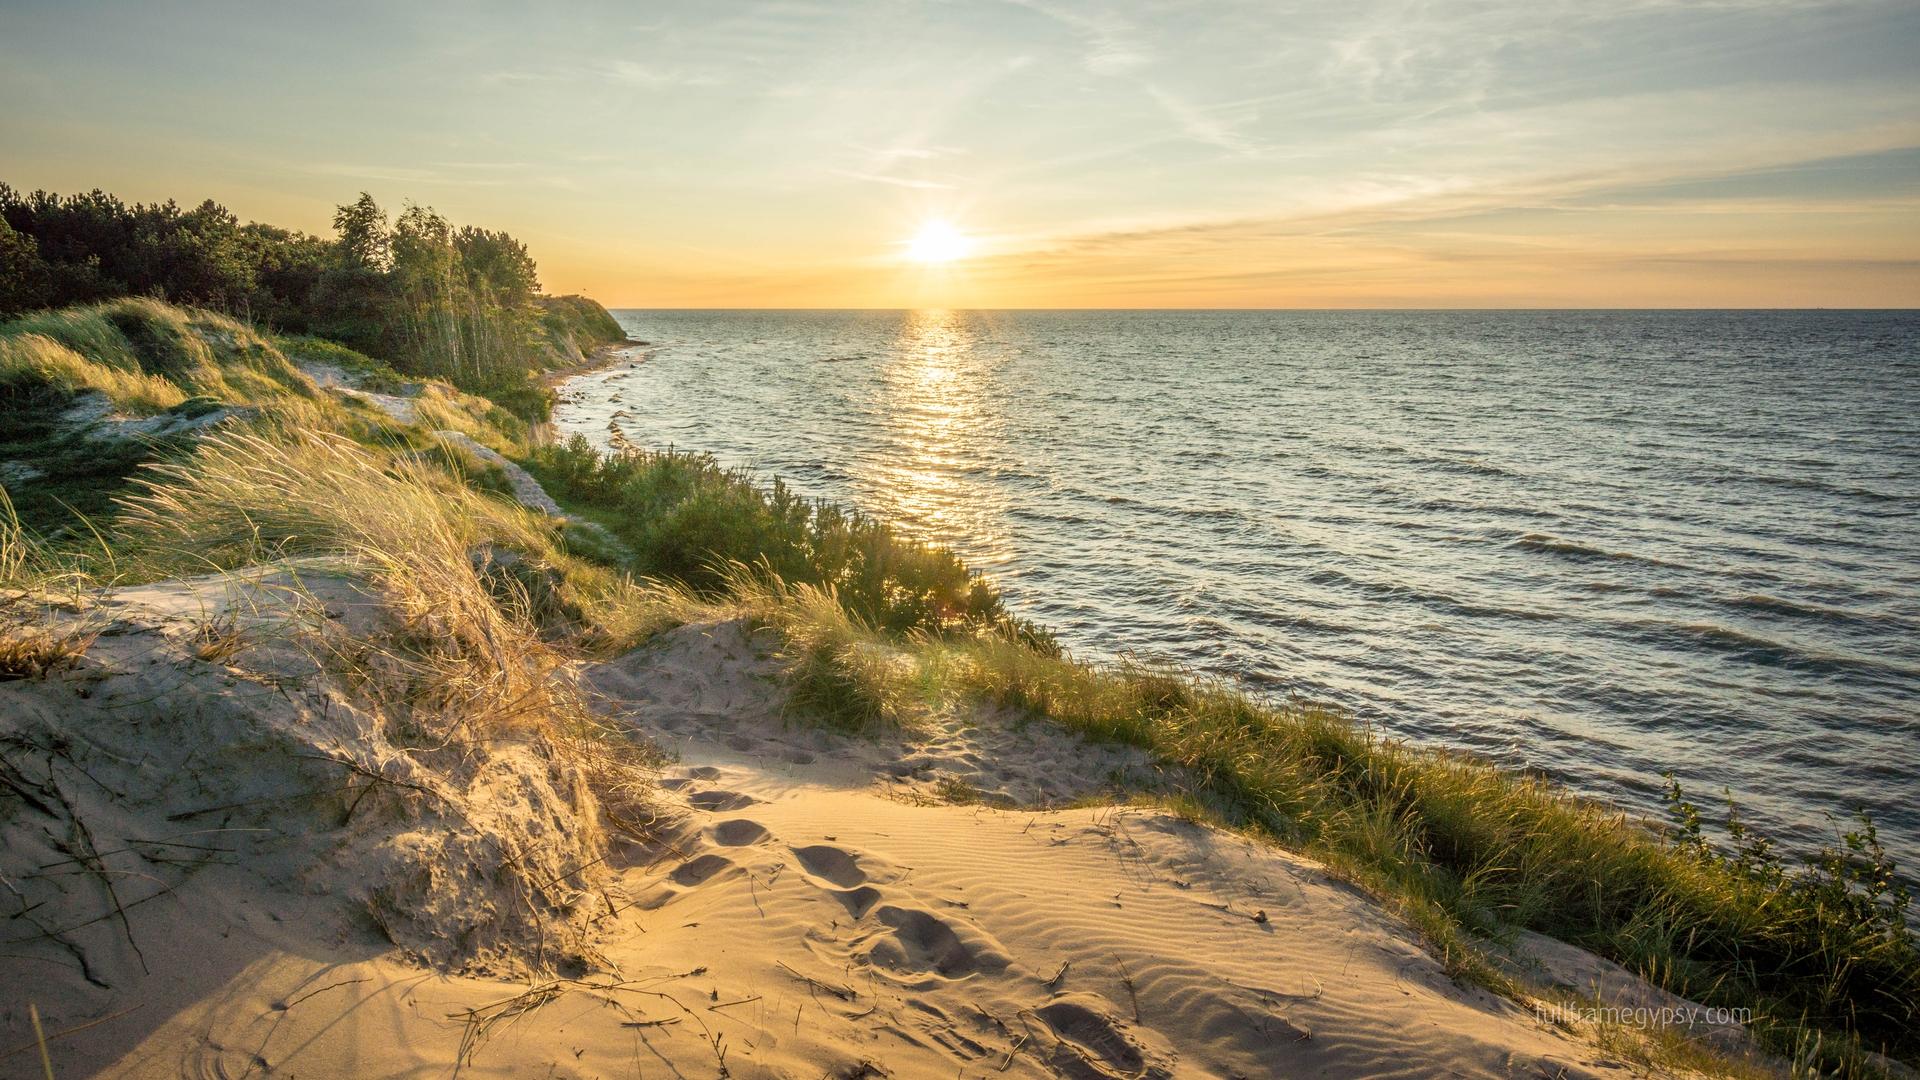 Northwest shore at Kreptitzer Heide, Germany